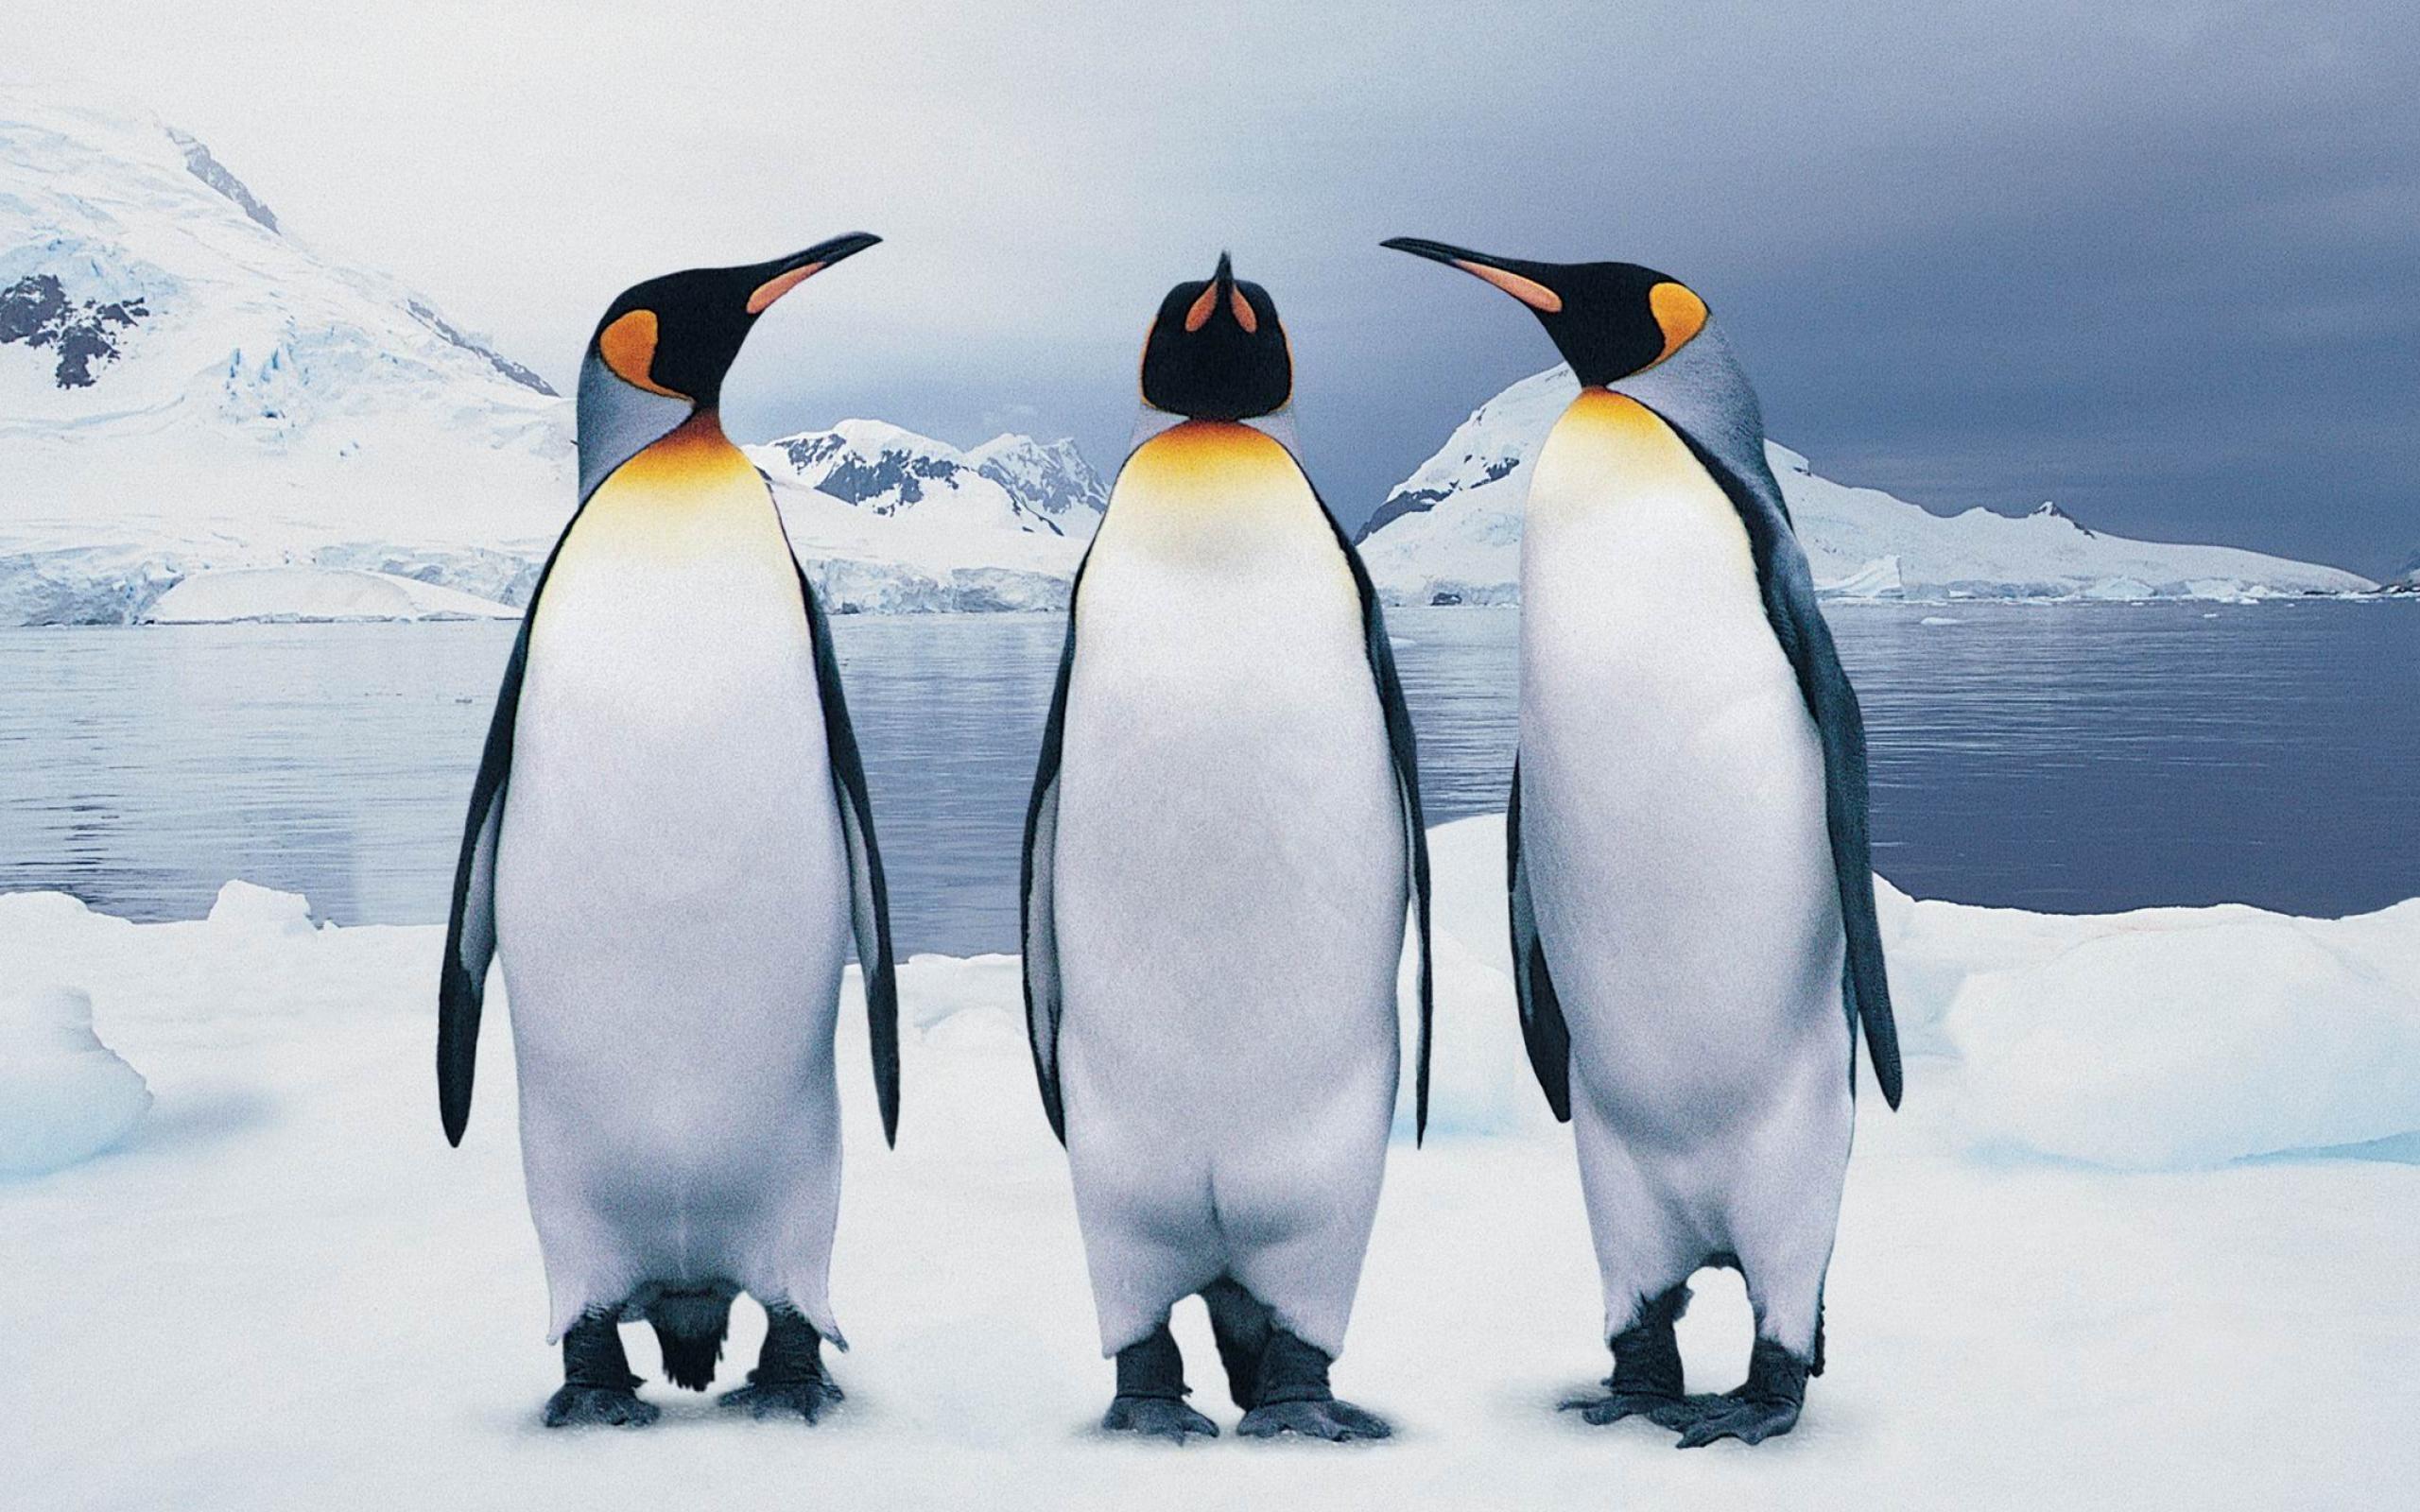 Penguin wallpaper 2560x1600 74936 2560x1600